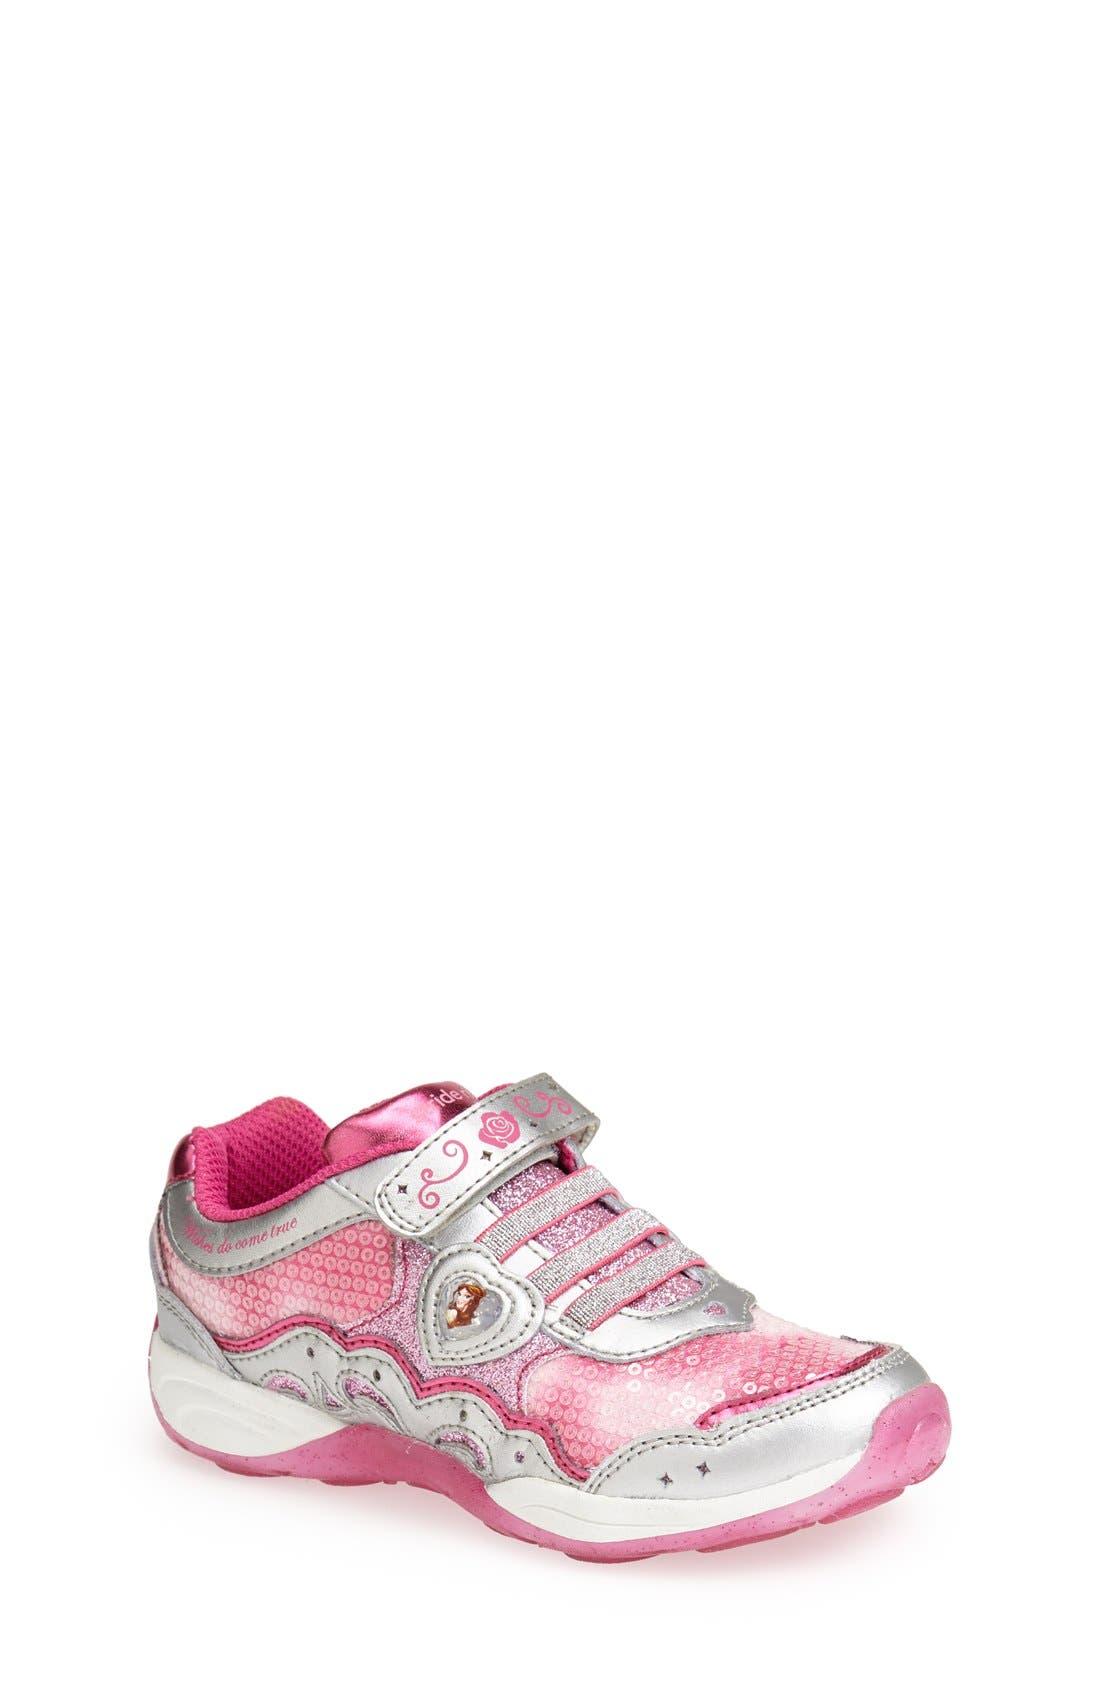 Main Image - Stride Rite 'Disney Wish Lights - Belle' Light-Up Sneaker (Walker, Toddler & Little Kid)